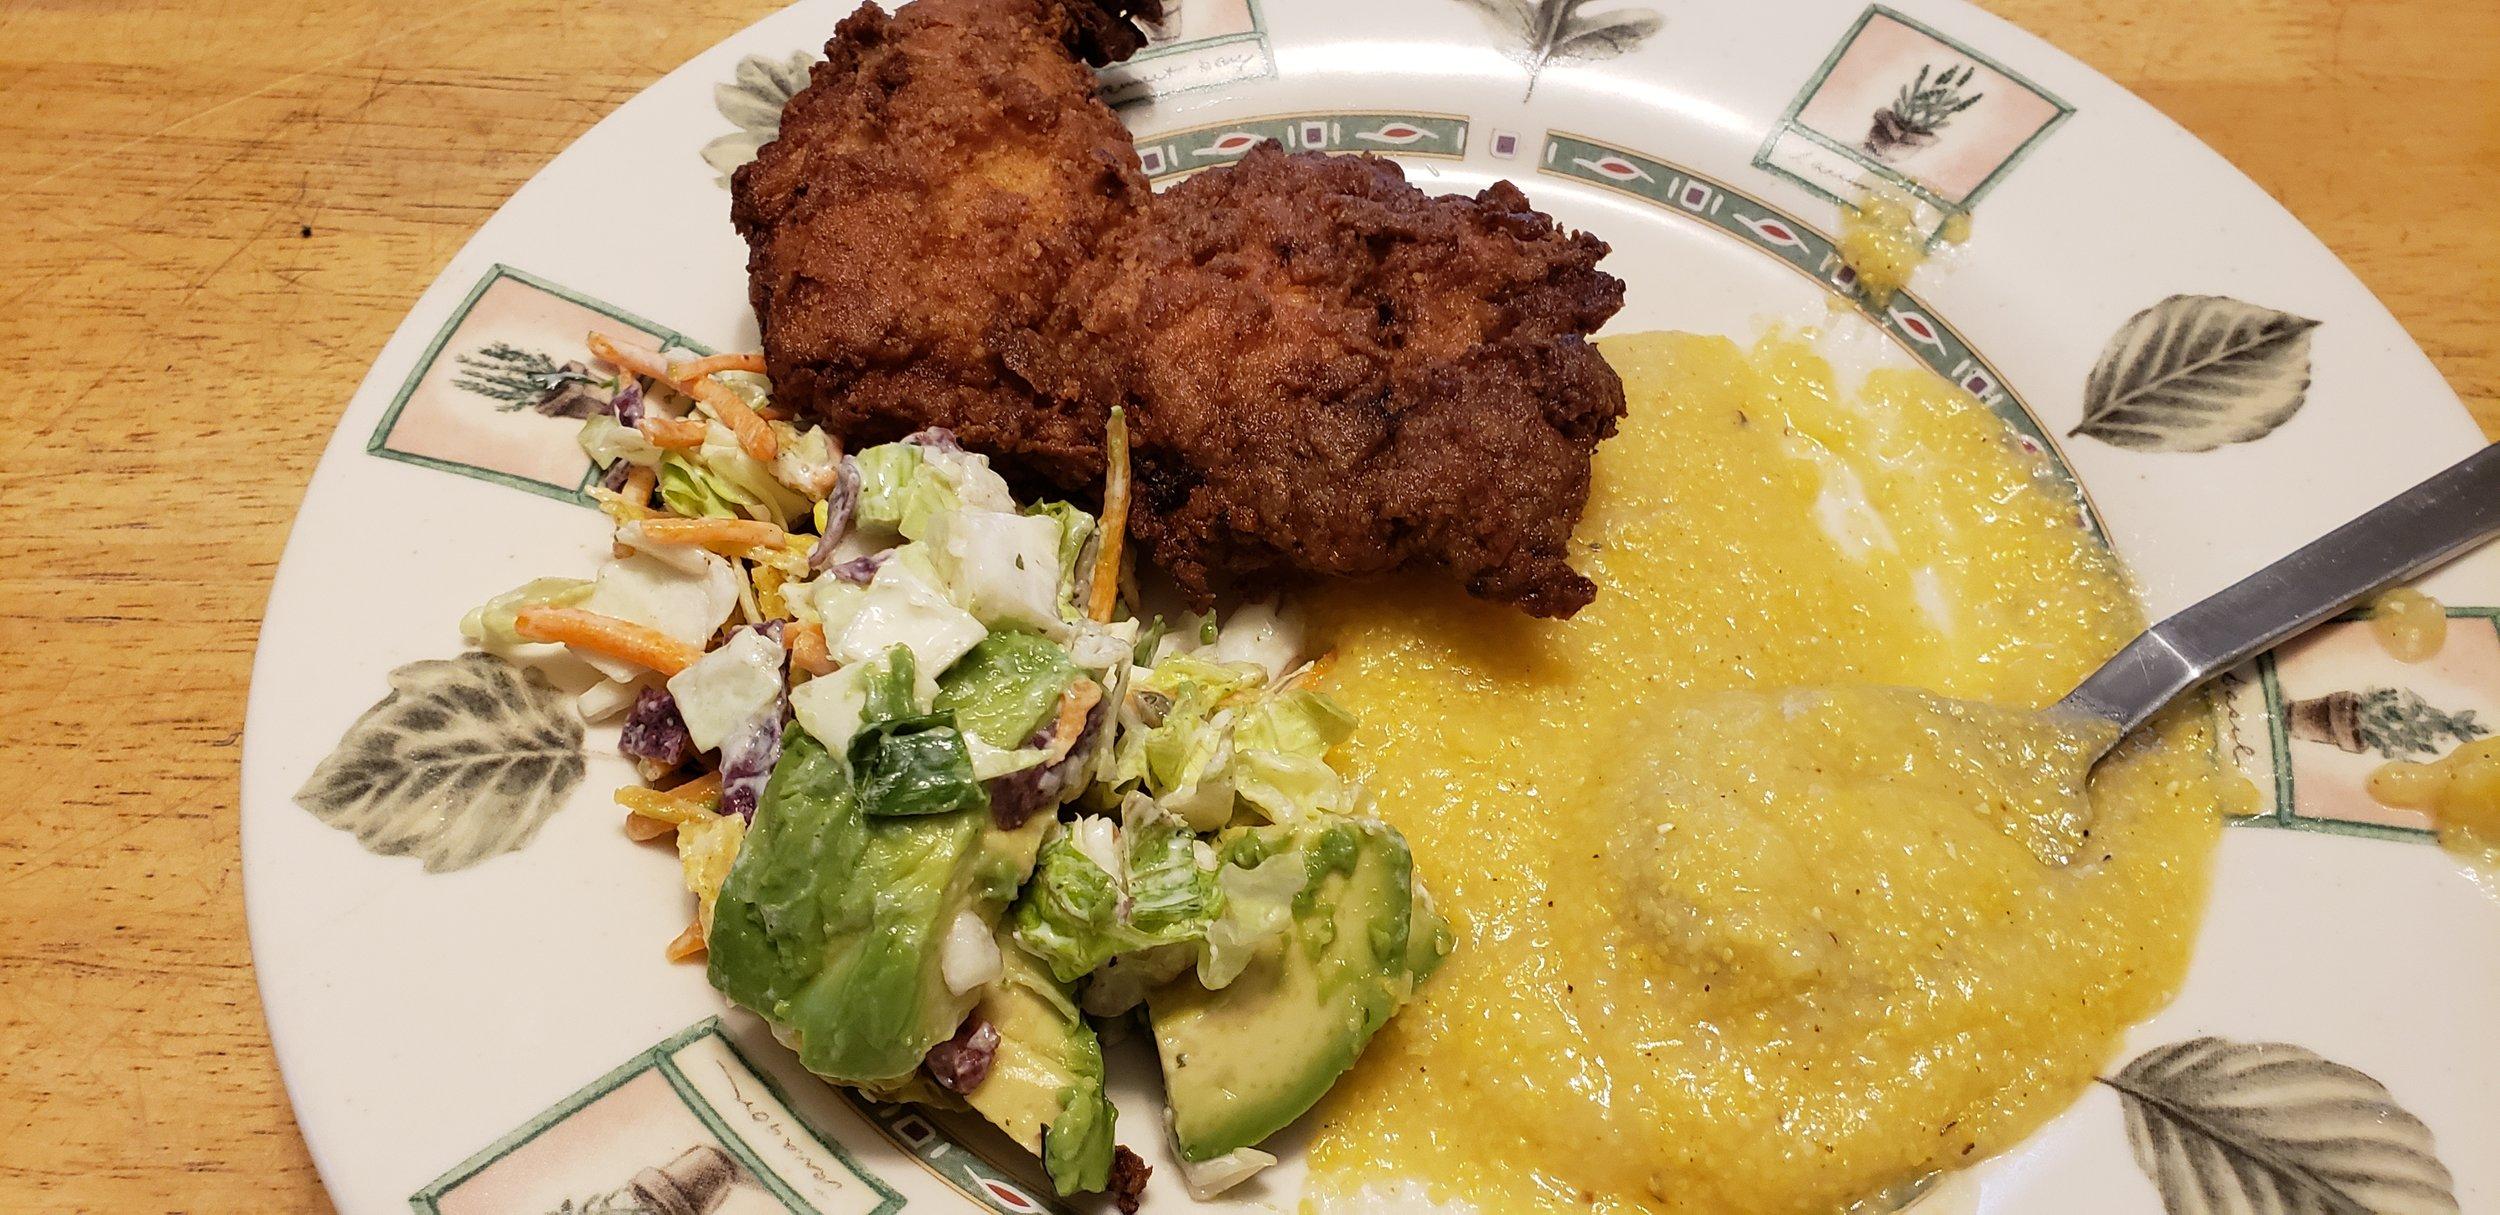 I served mine with an avacado/cilantro salad and buttery, creamy polenta.